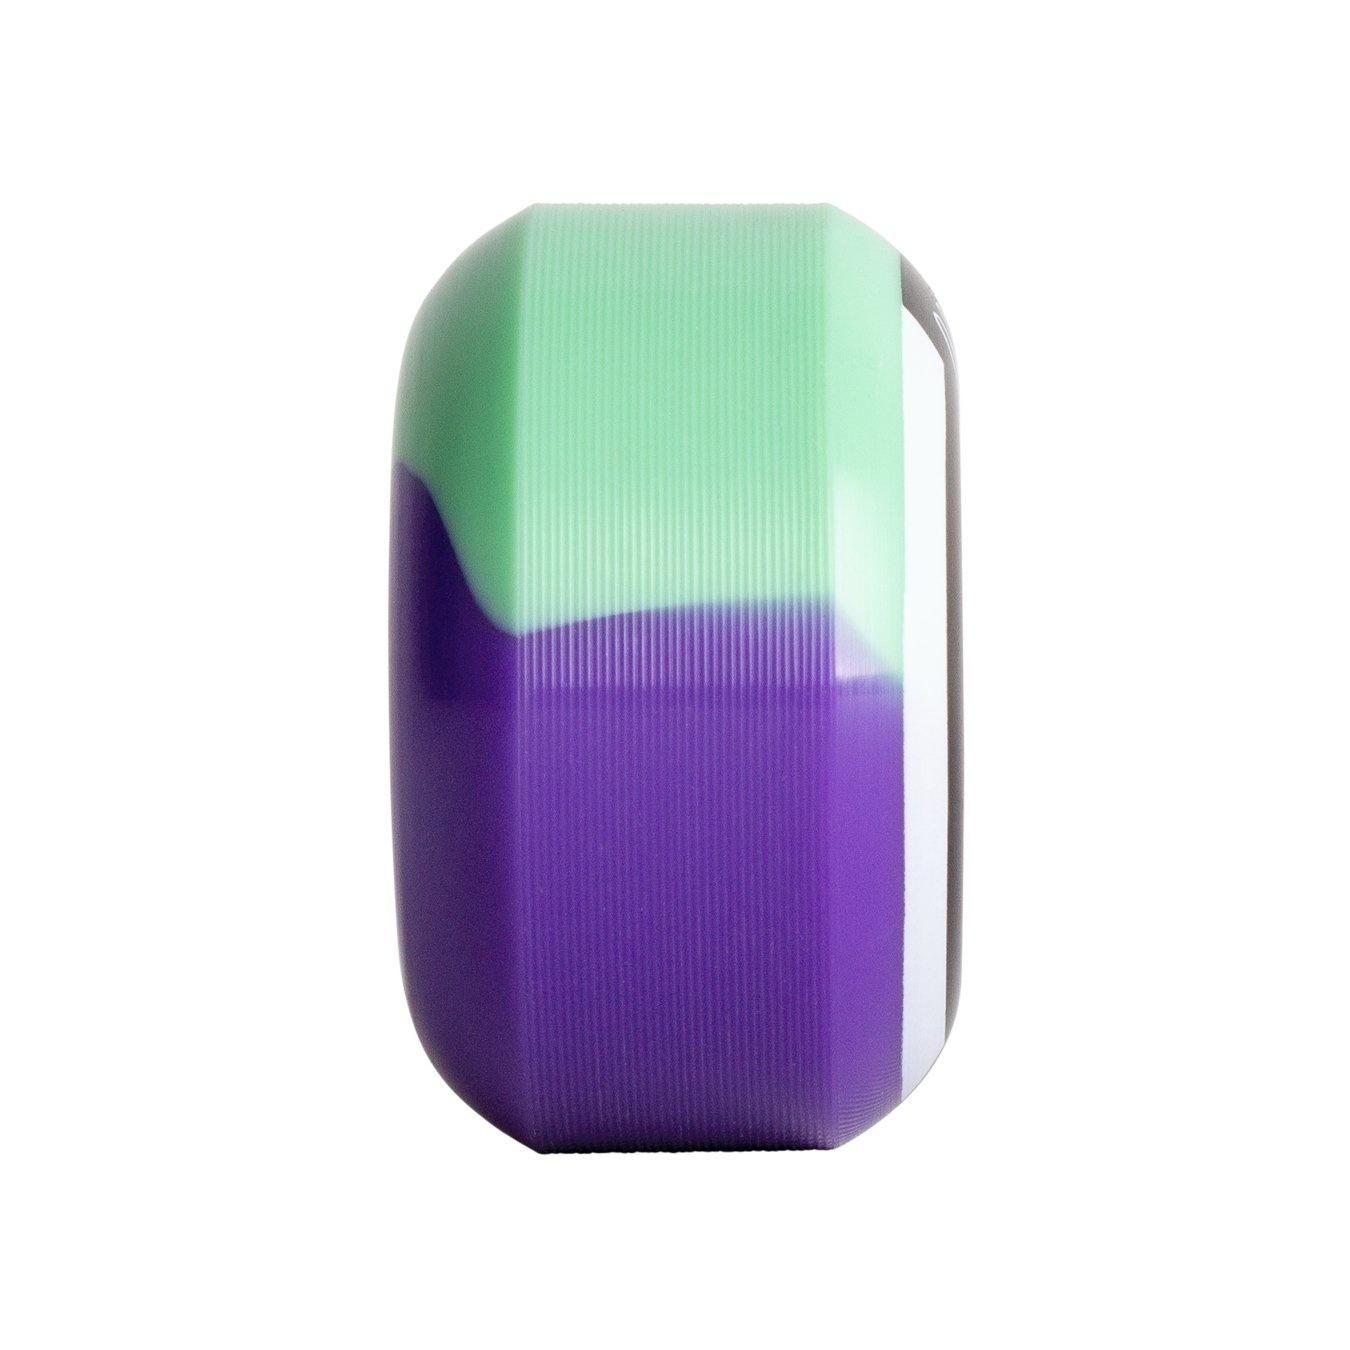 Orbs Apparitions 56mm Mint/Lavender